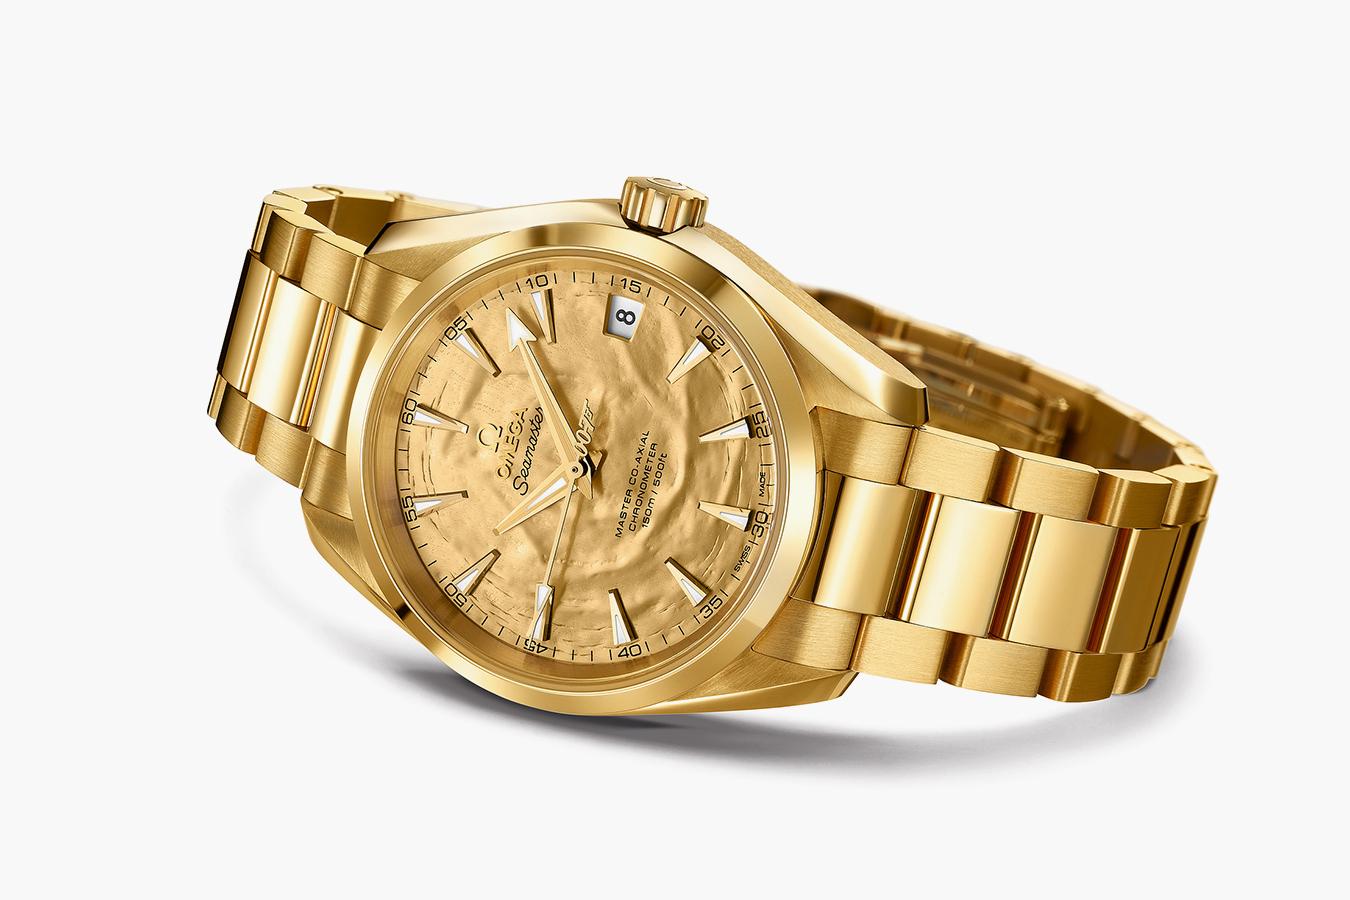 omega-seamaster-aqua-terra-goldfinger-watch-01.jpg